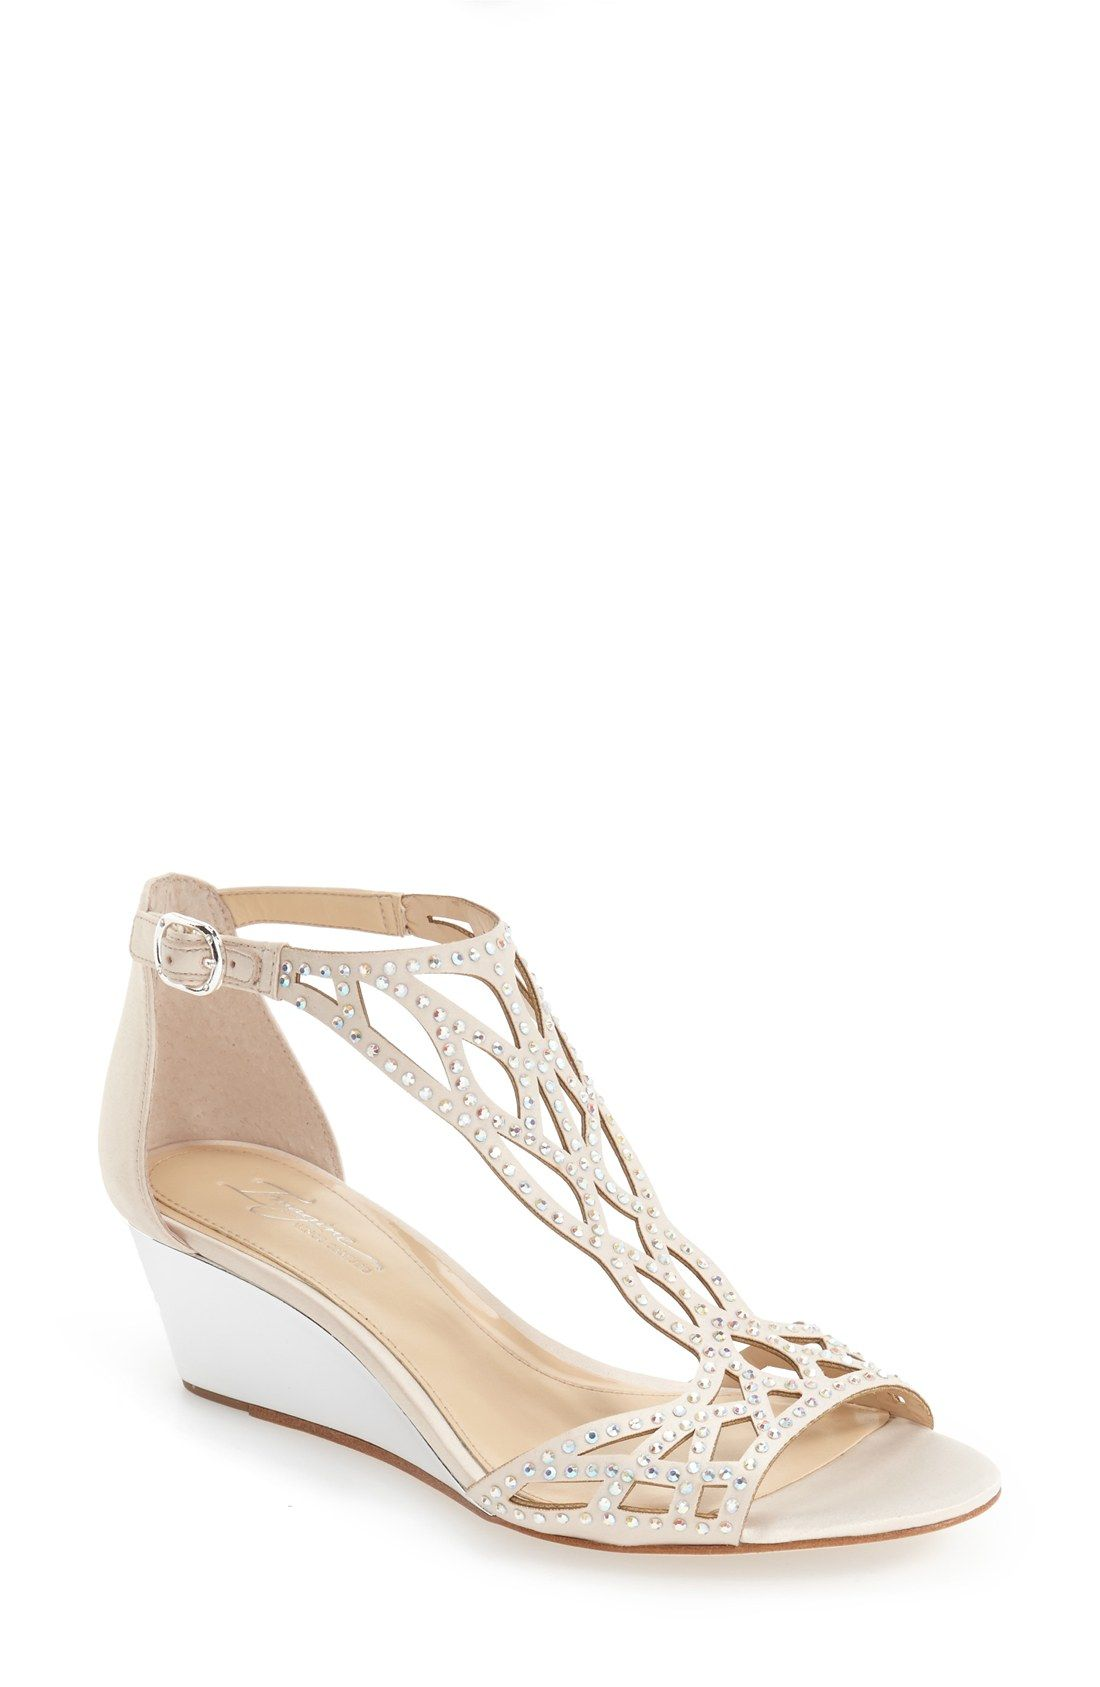 Black dress sandals for wedding - Wedding Shoe With Low Wedge For Garden Ceremony Https Www Facebook